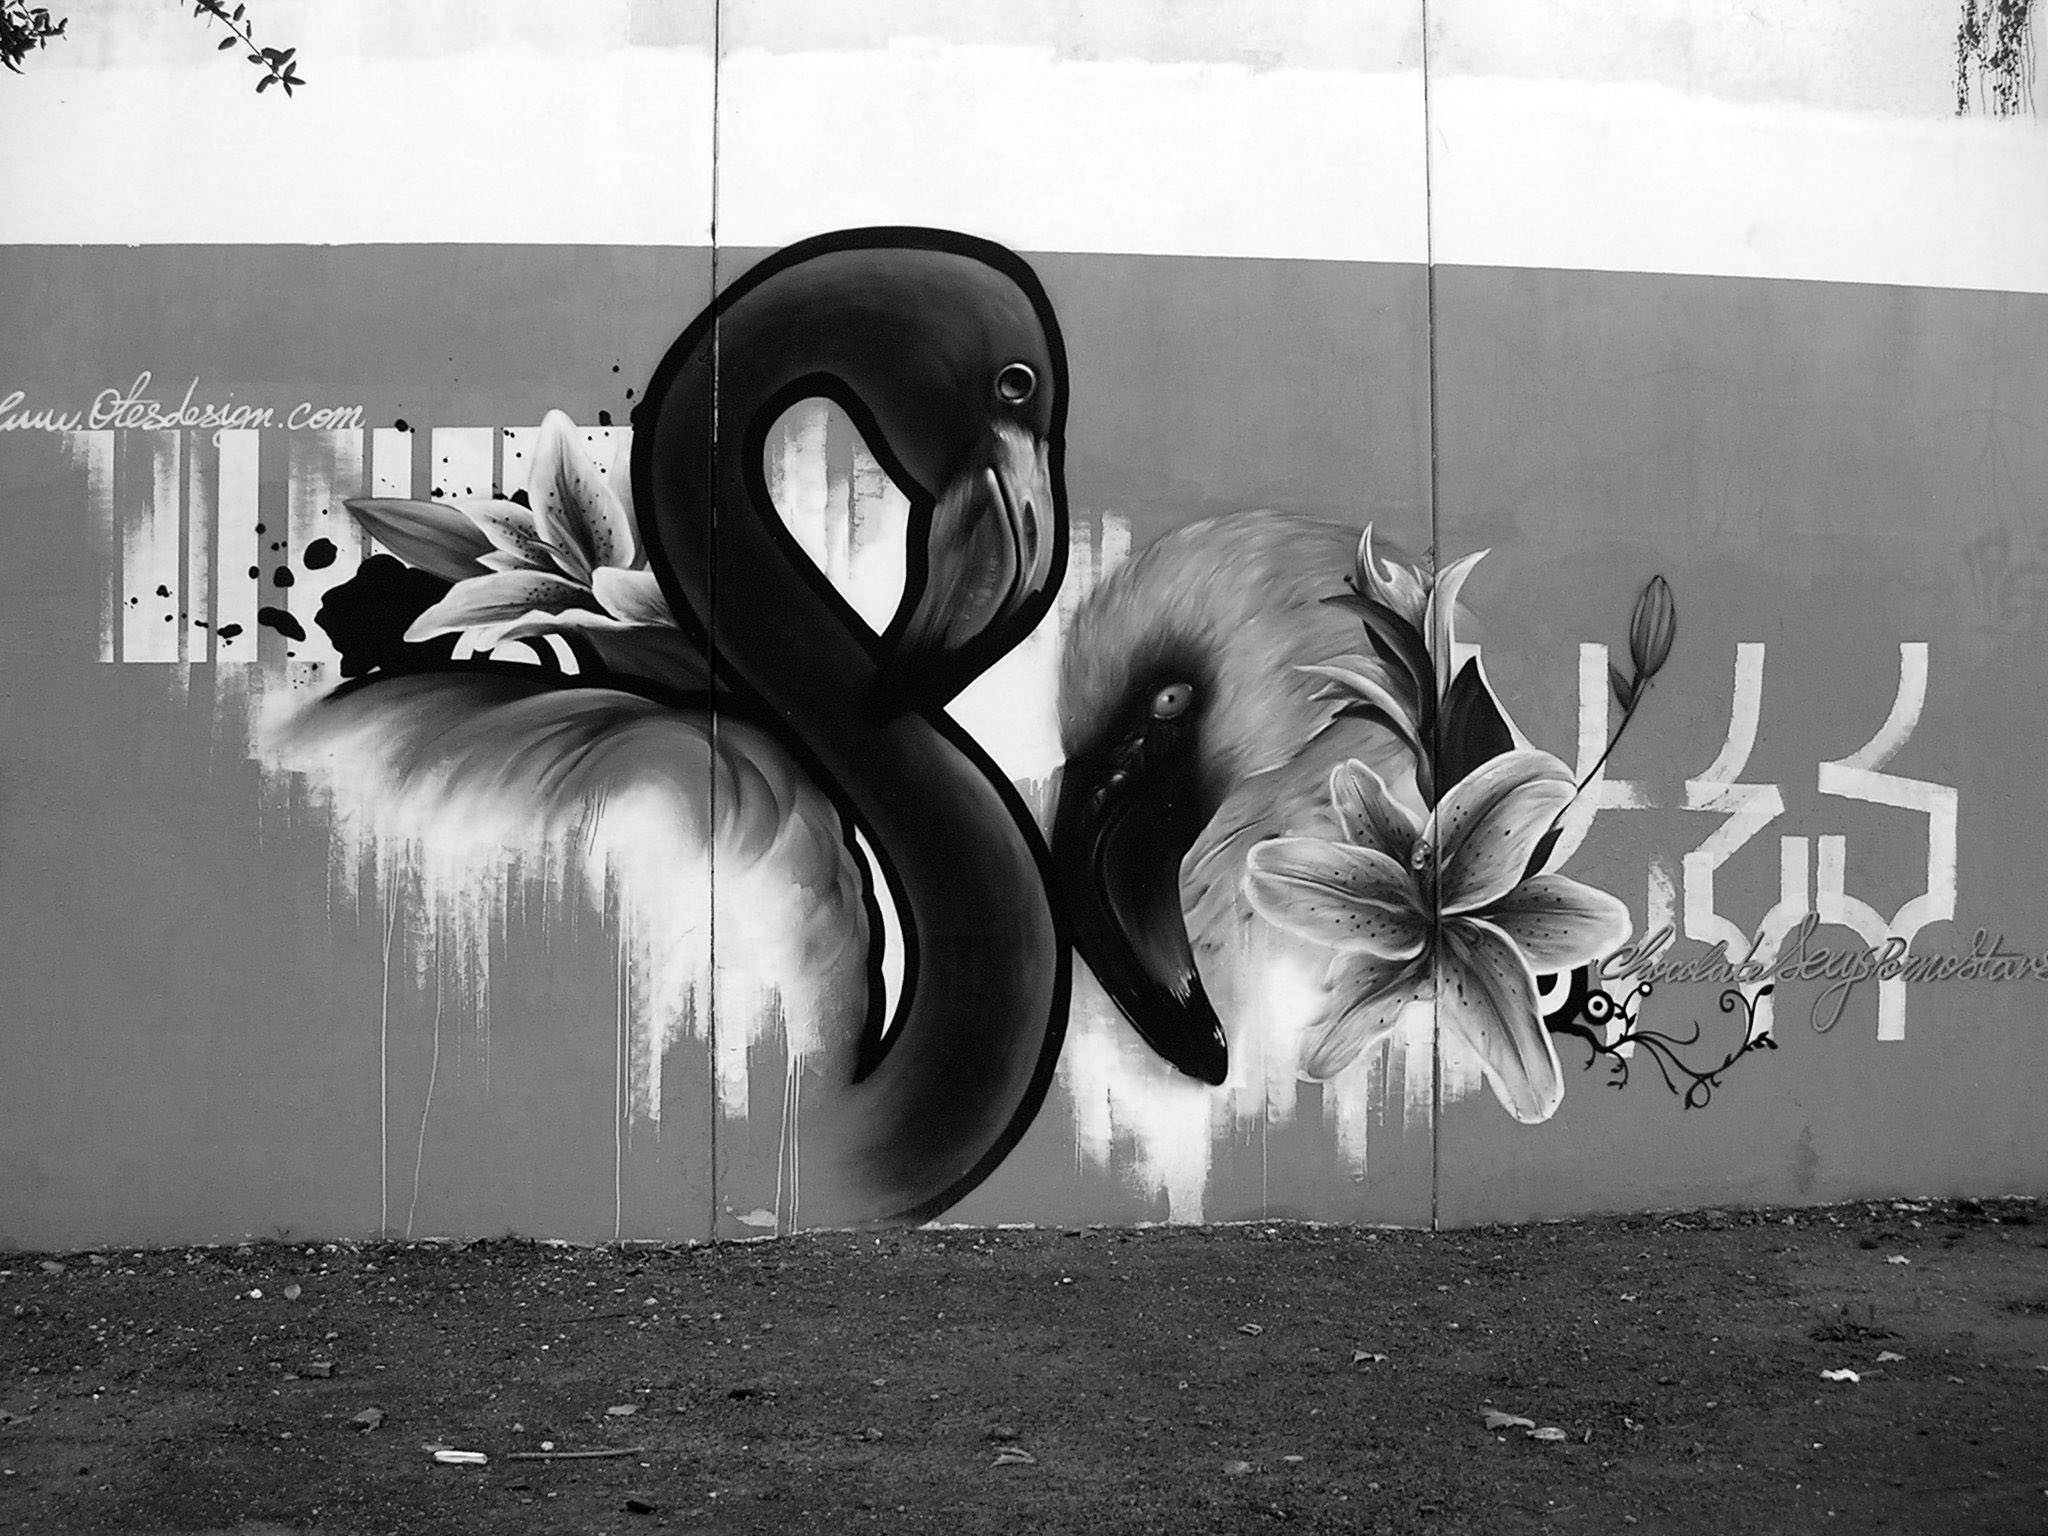 Detalle. Grafiti en el Paseo Rey Juan Carlos I en Sevilla - 2008